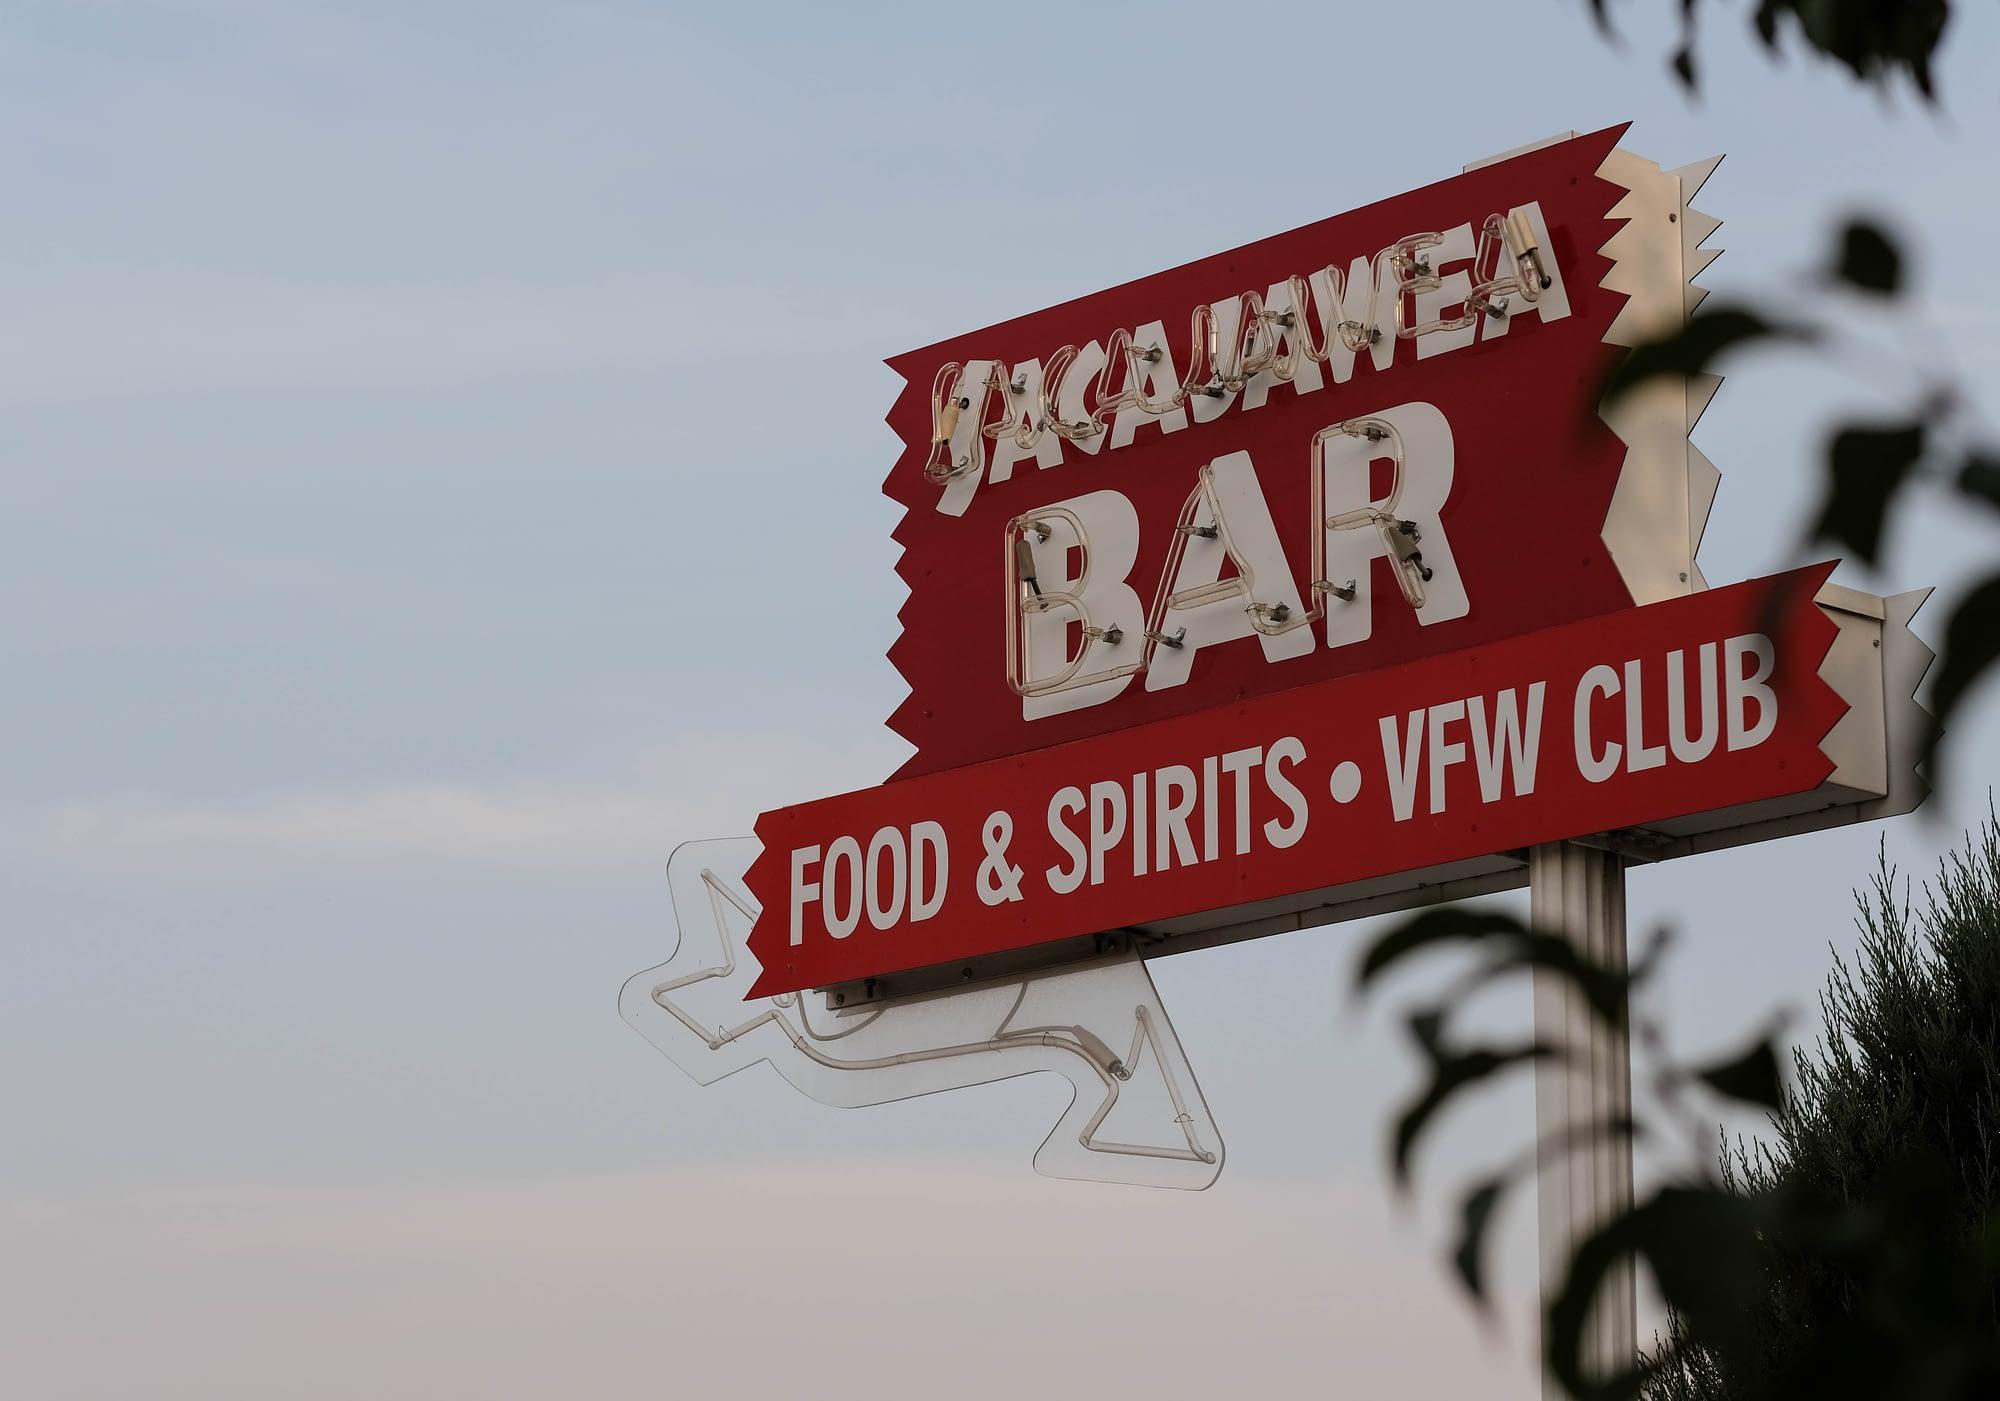 Anniversary Weekend at Sacajawea Hotel